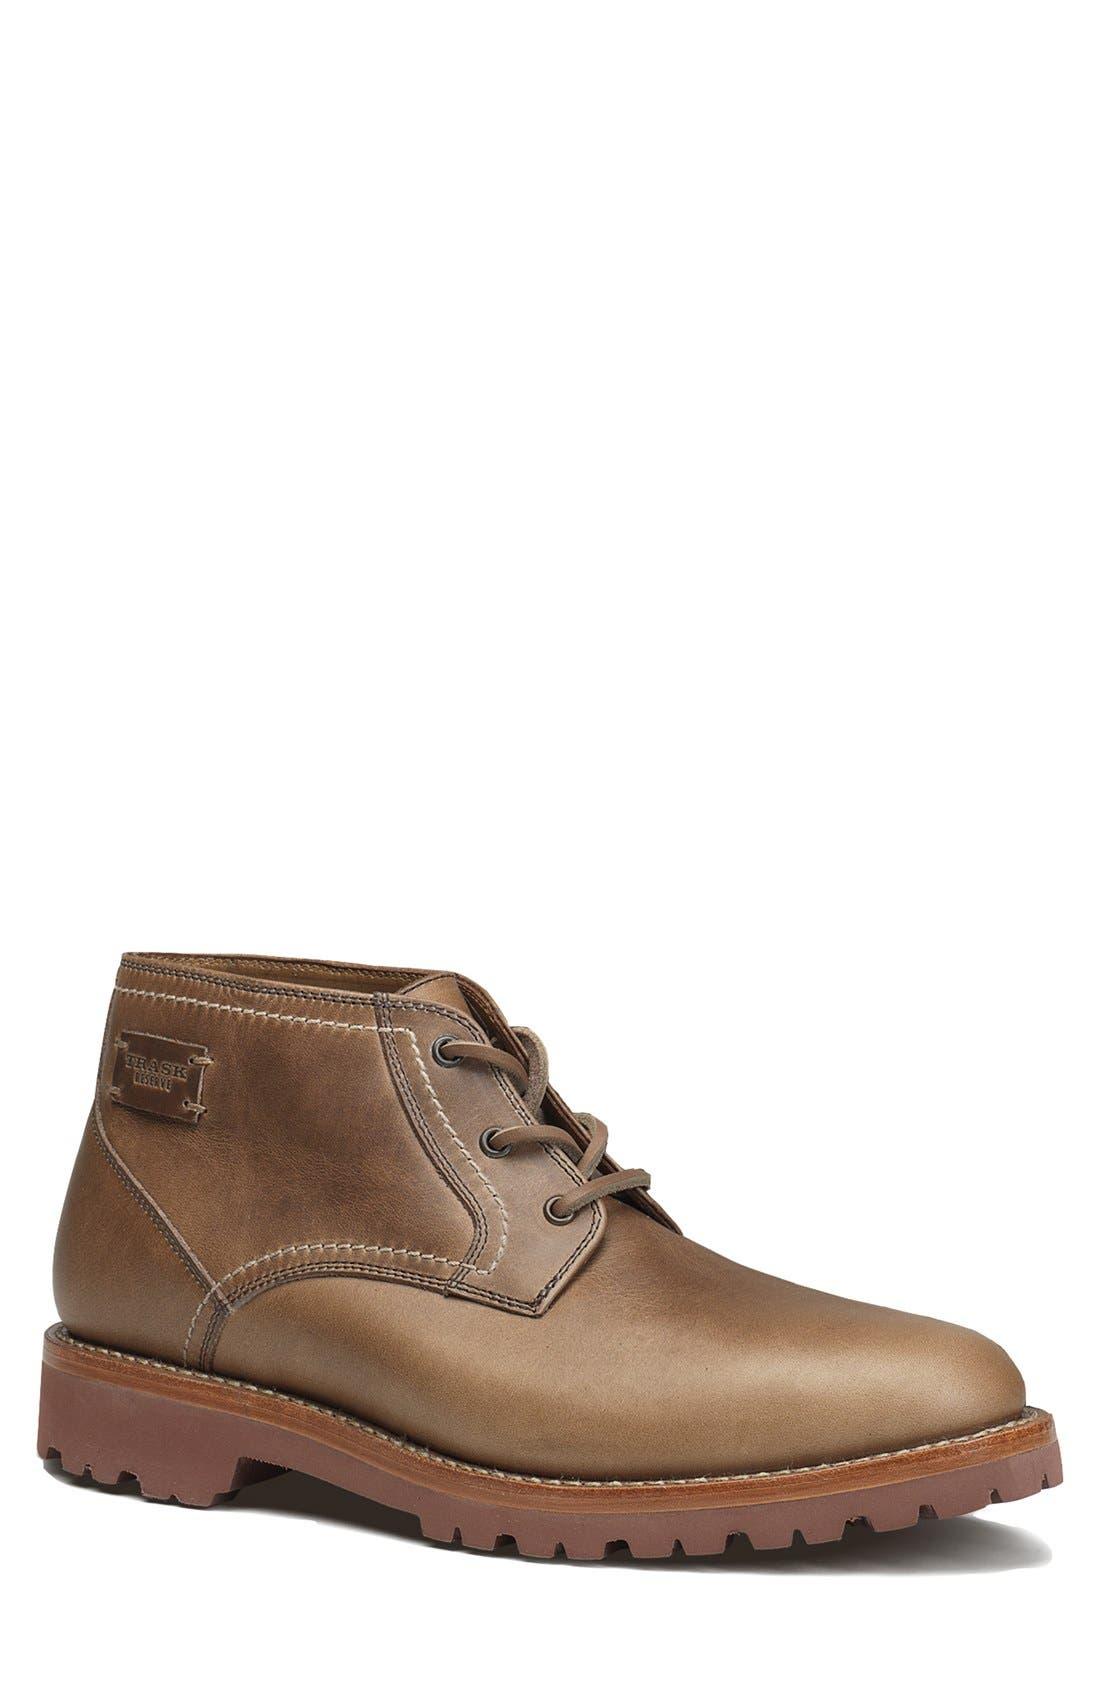 'Bighorn' Plain Toe Boot,                             Main thumbnail 3, color,